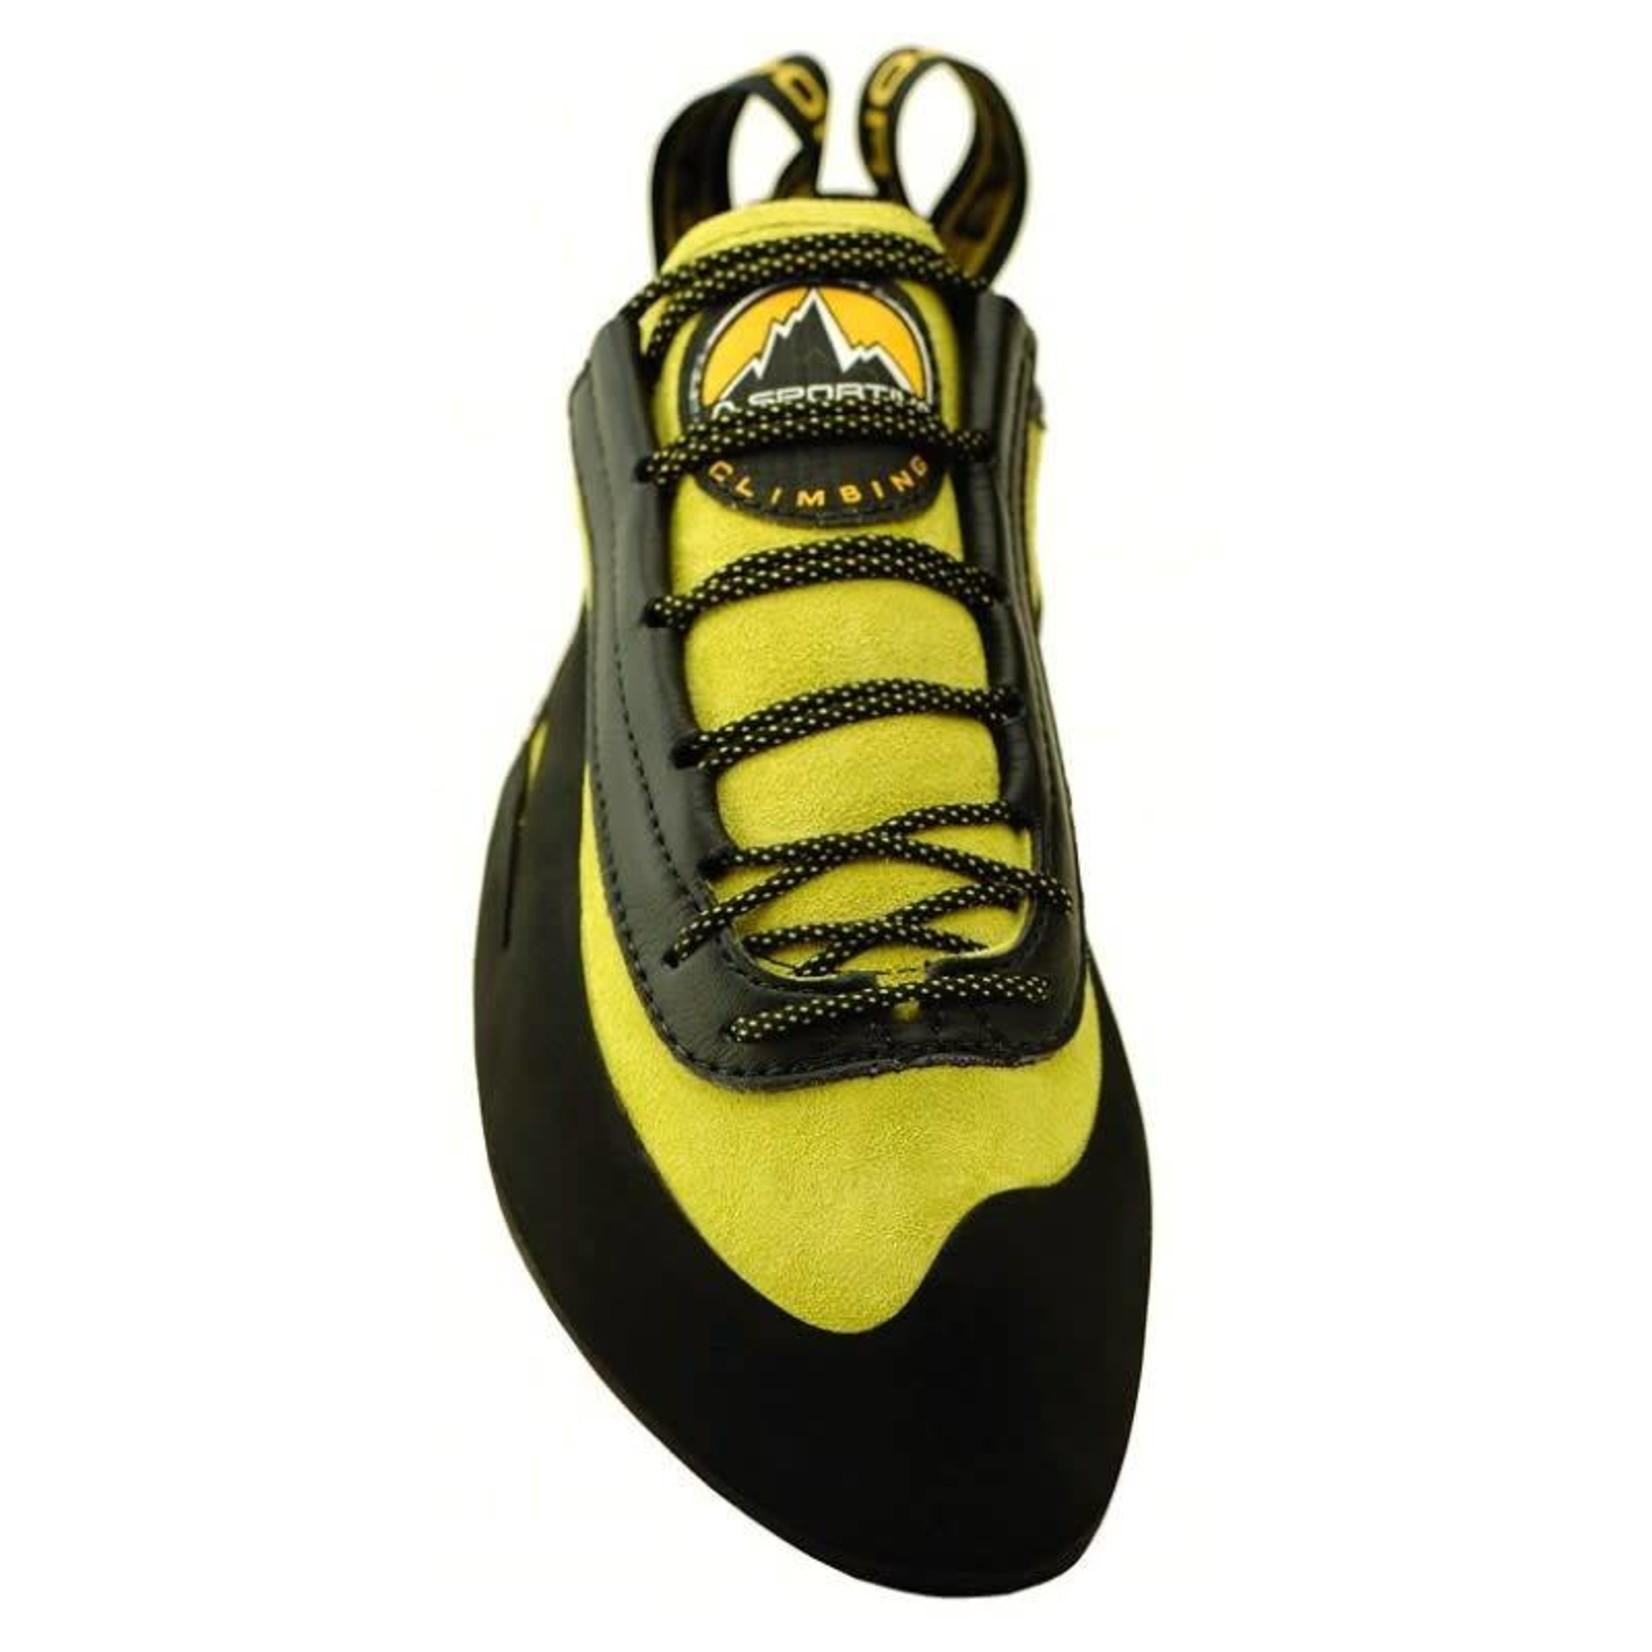 La Sportiva Miura Lace-up Climbing Shoes | Vertical Addiction ...